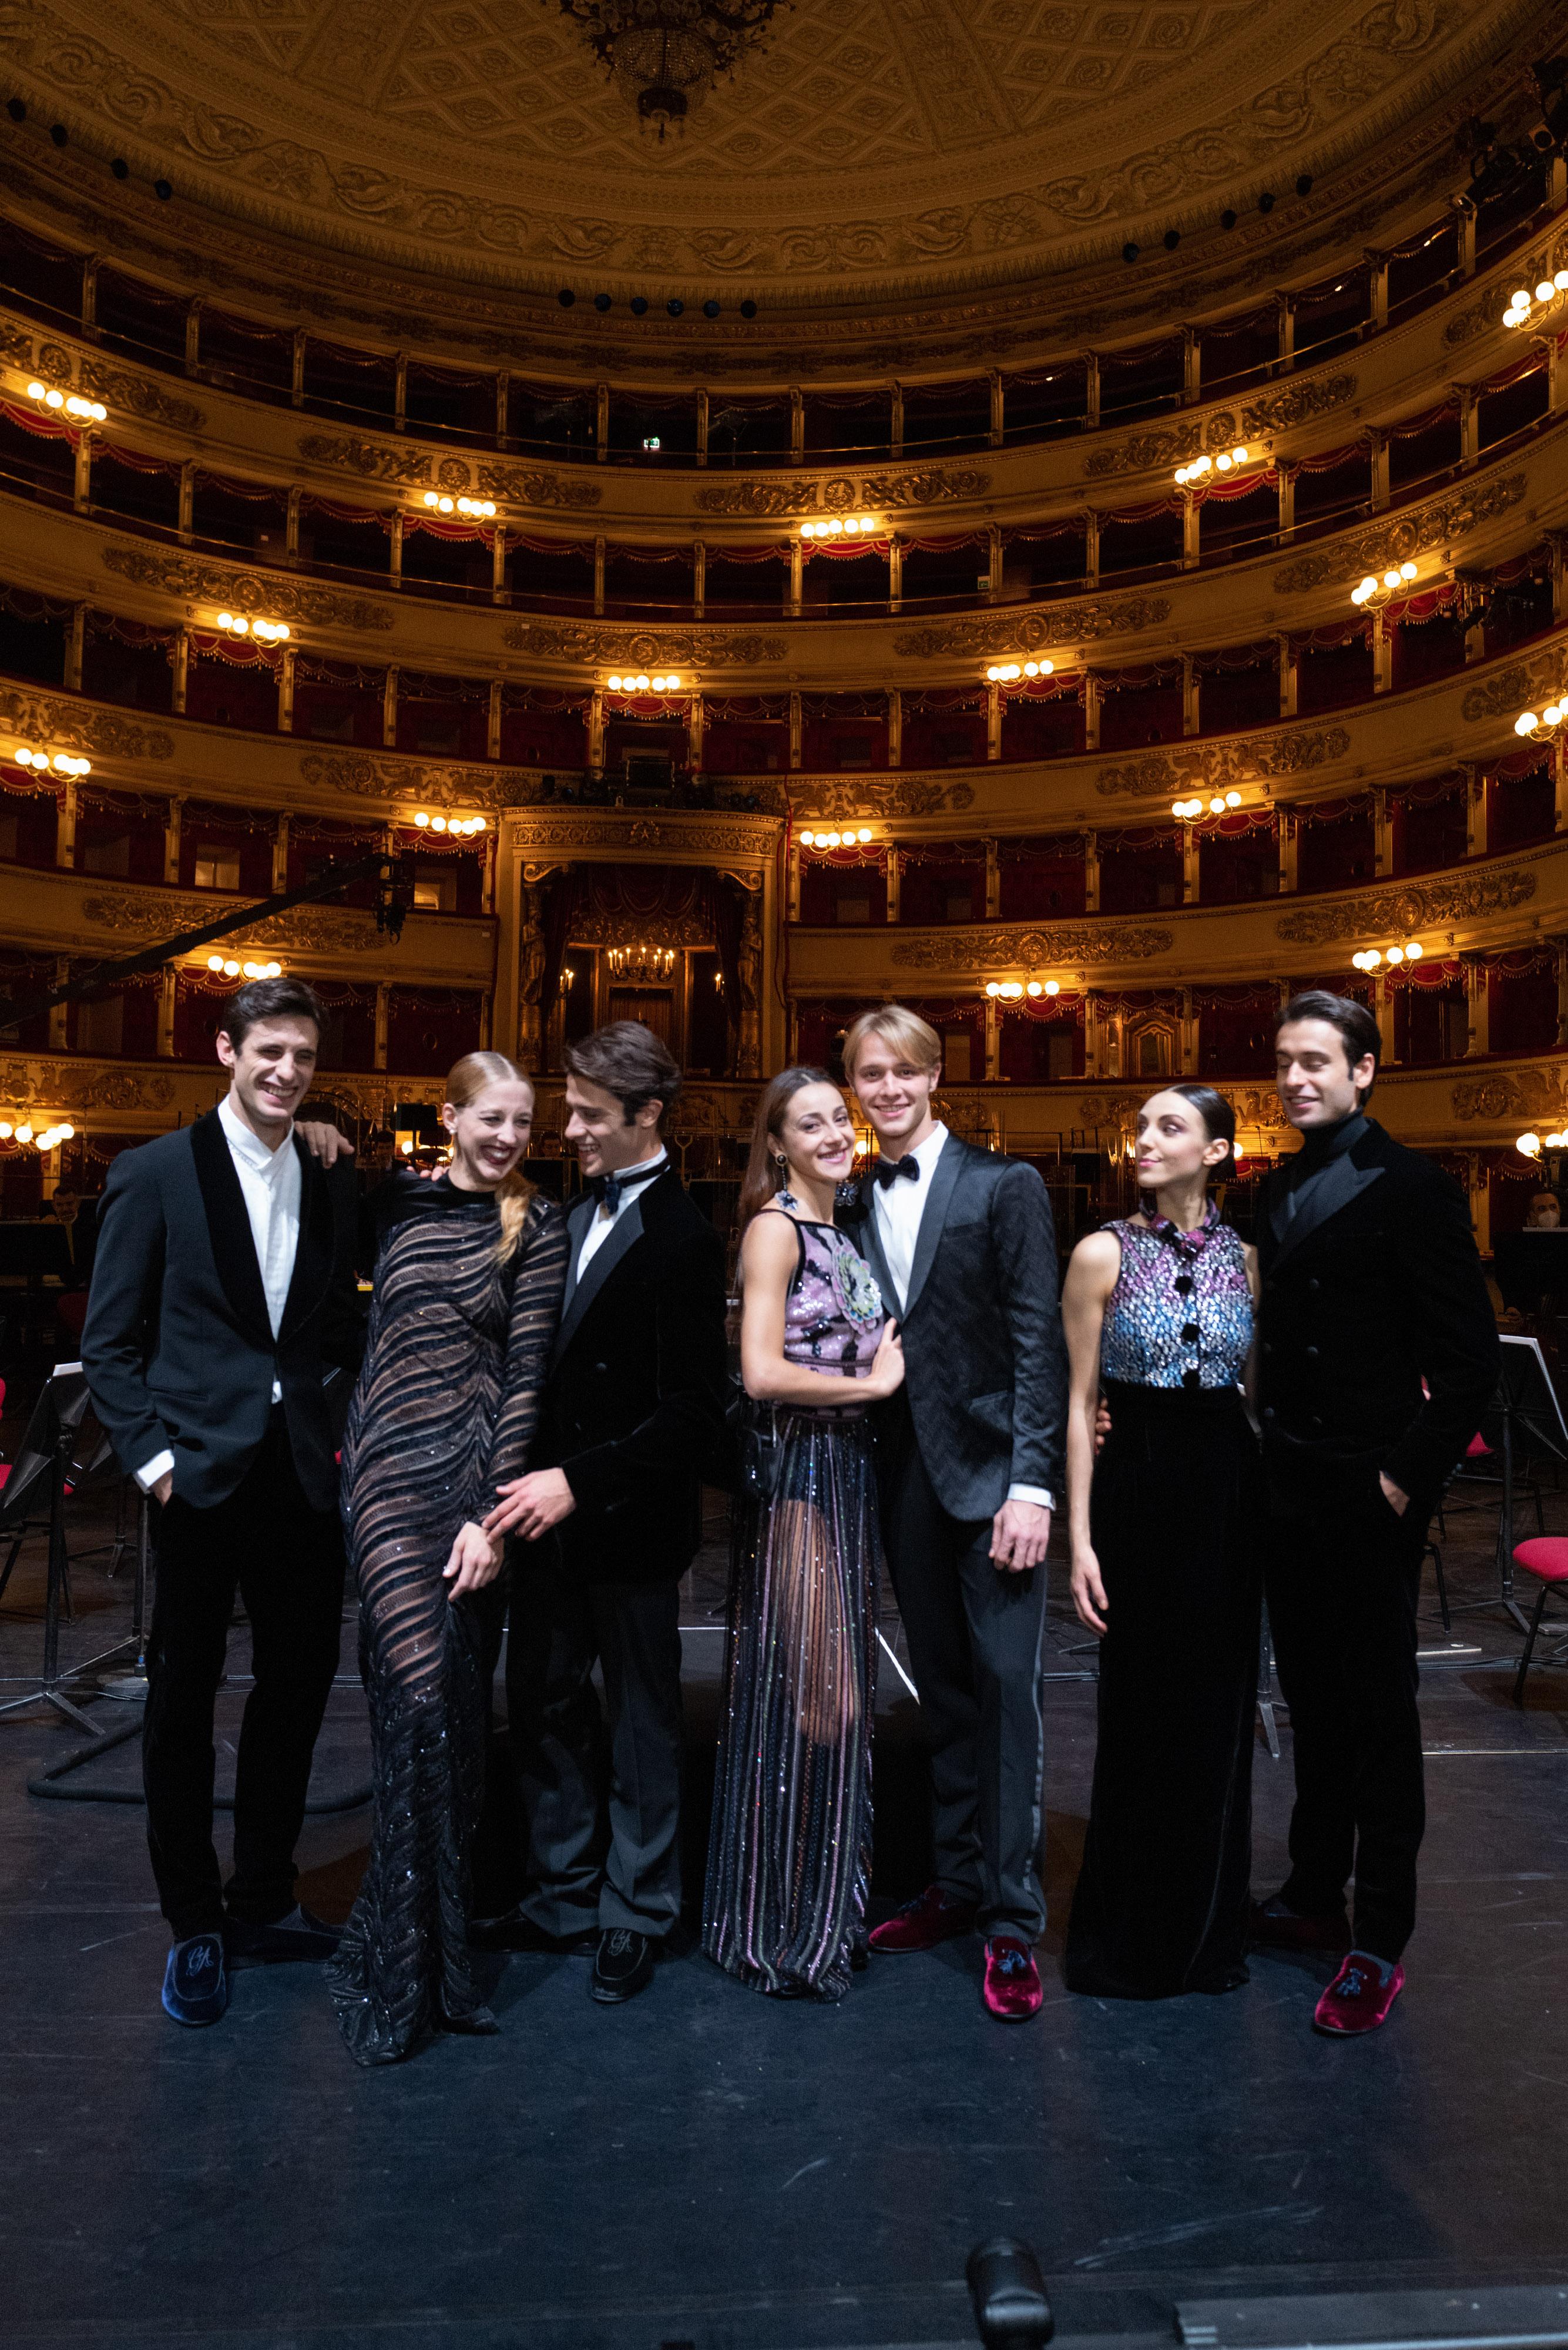 Nicola Del Freo, Virna Toppi, Claudio Coviello, Nicoletta Manni, Timofej Andrijashenko, Martina Arduino, Marco Agostino wearing Armani at La Scala's opera season opening night.